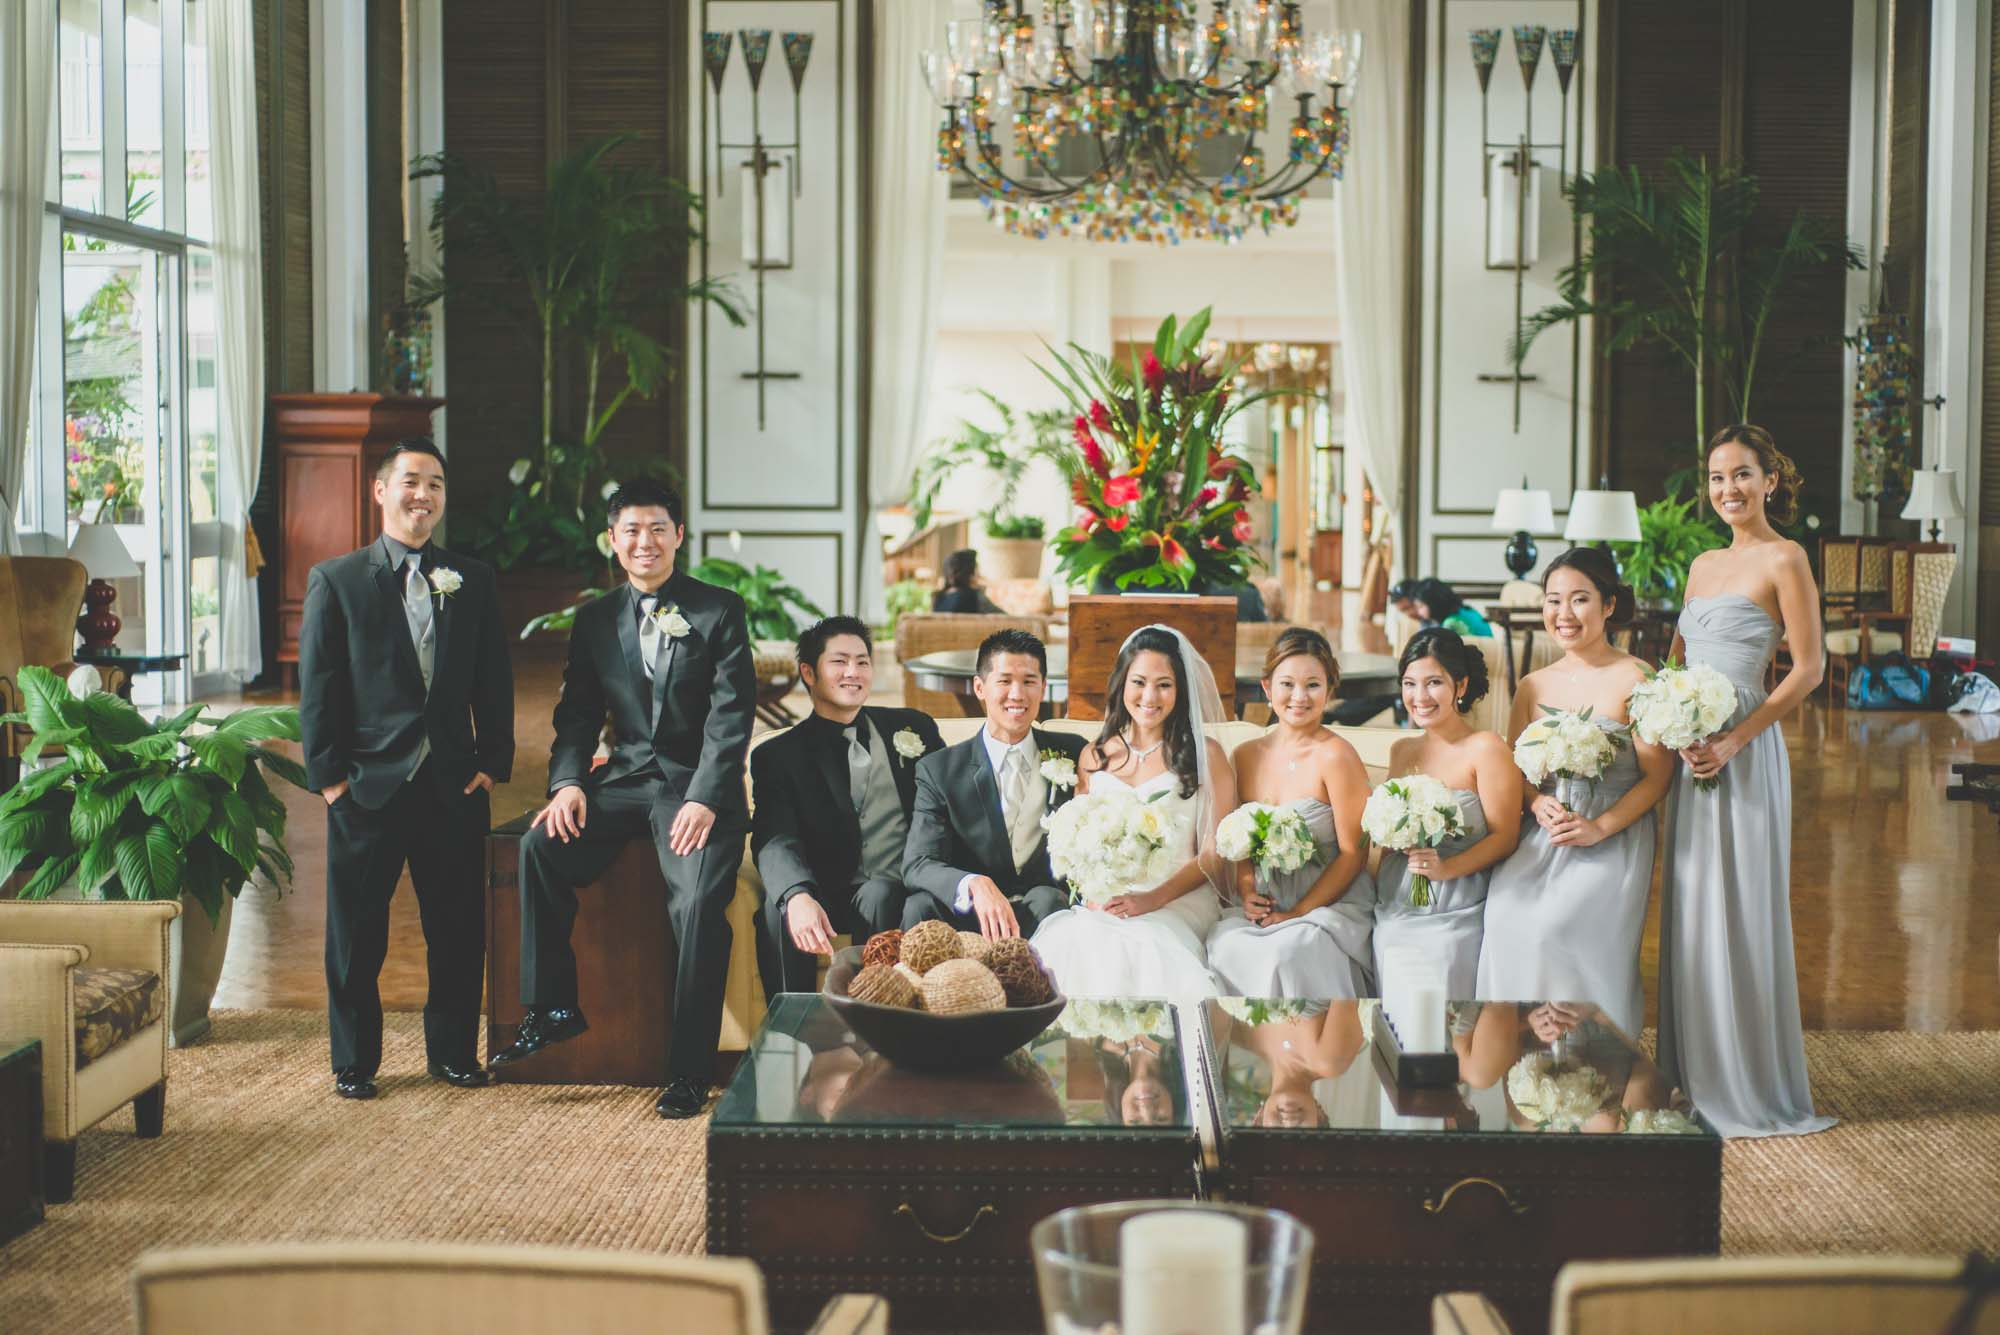 hawaii-wedding-photography-the-Kahala-and-Waialae-Country-club-150314-0013.jpg